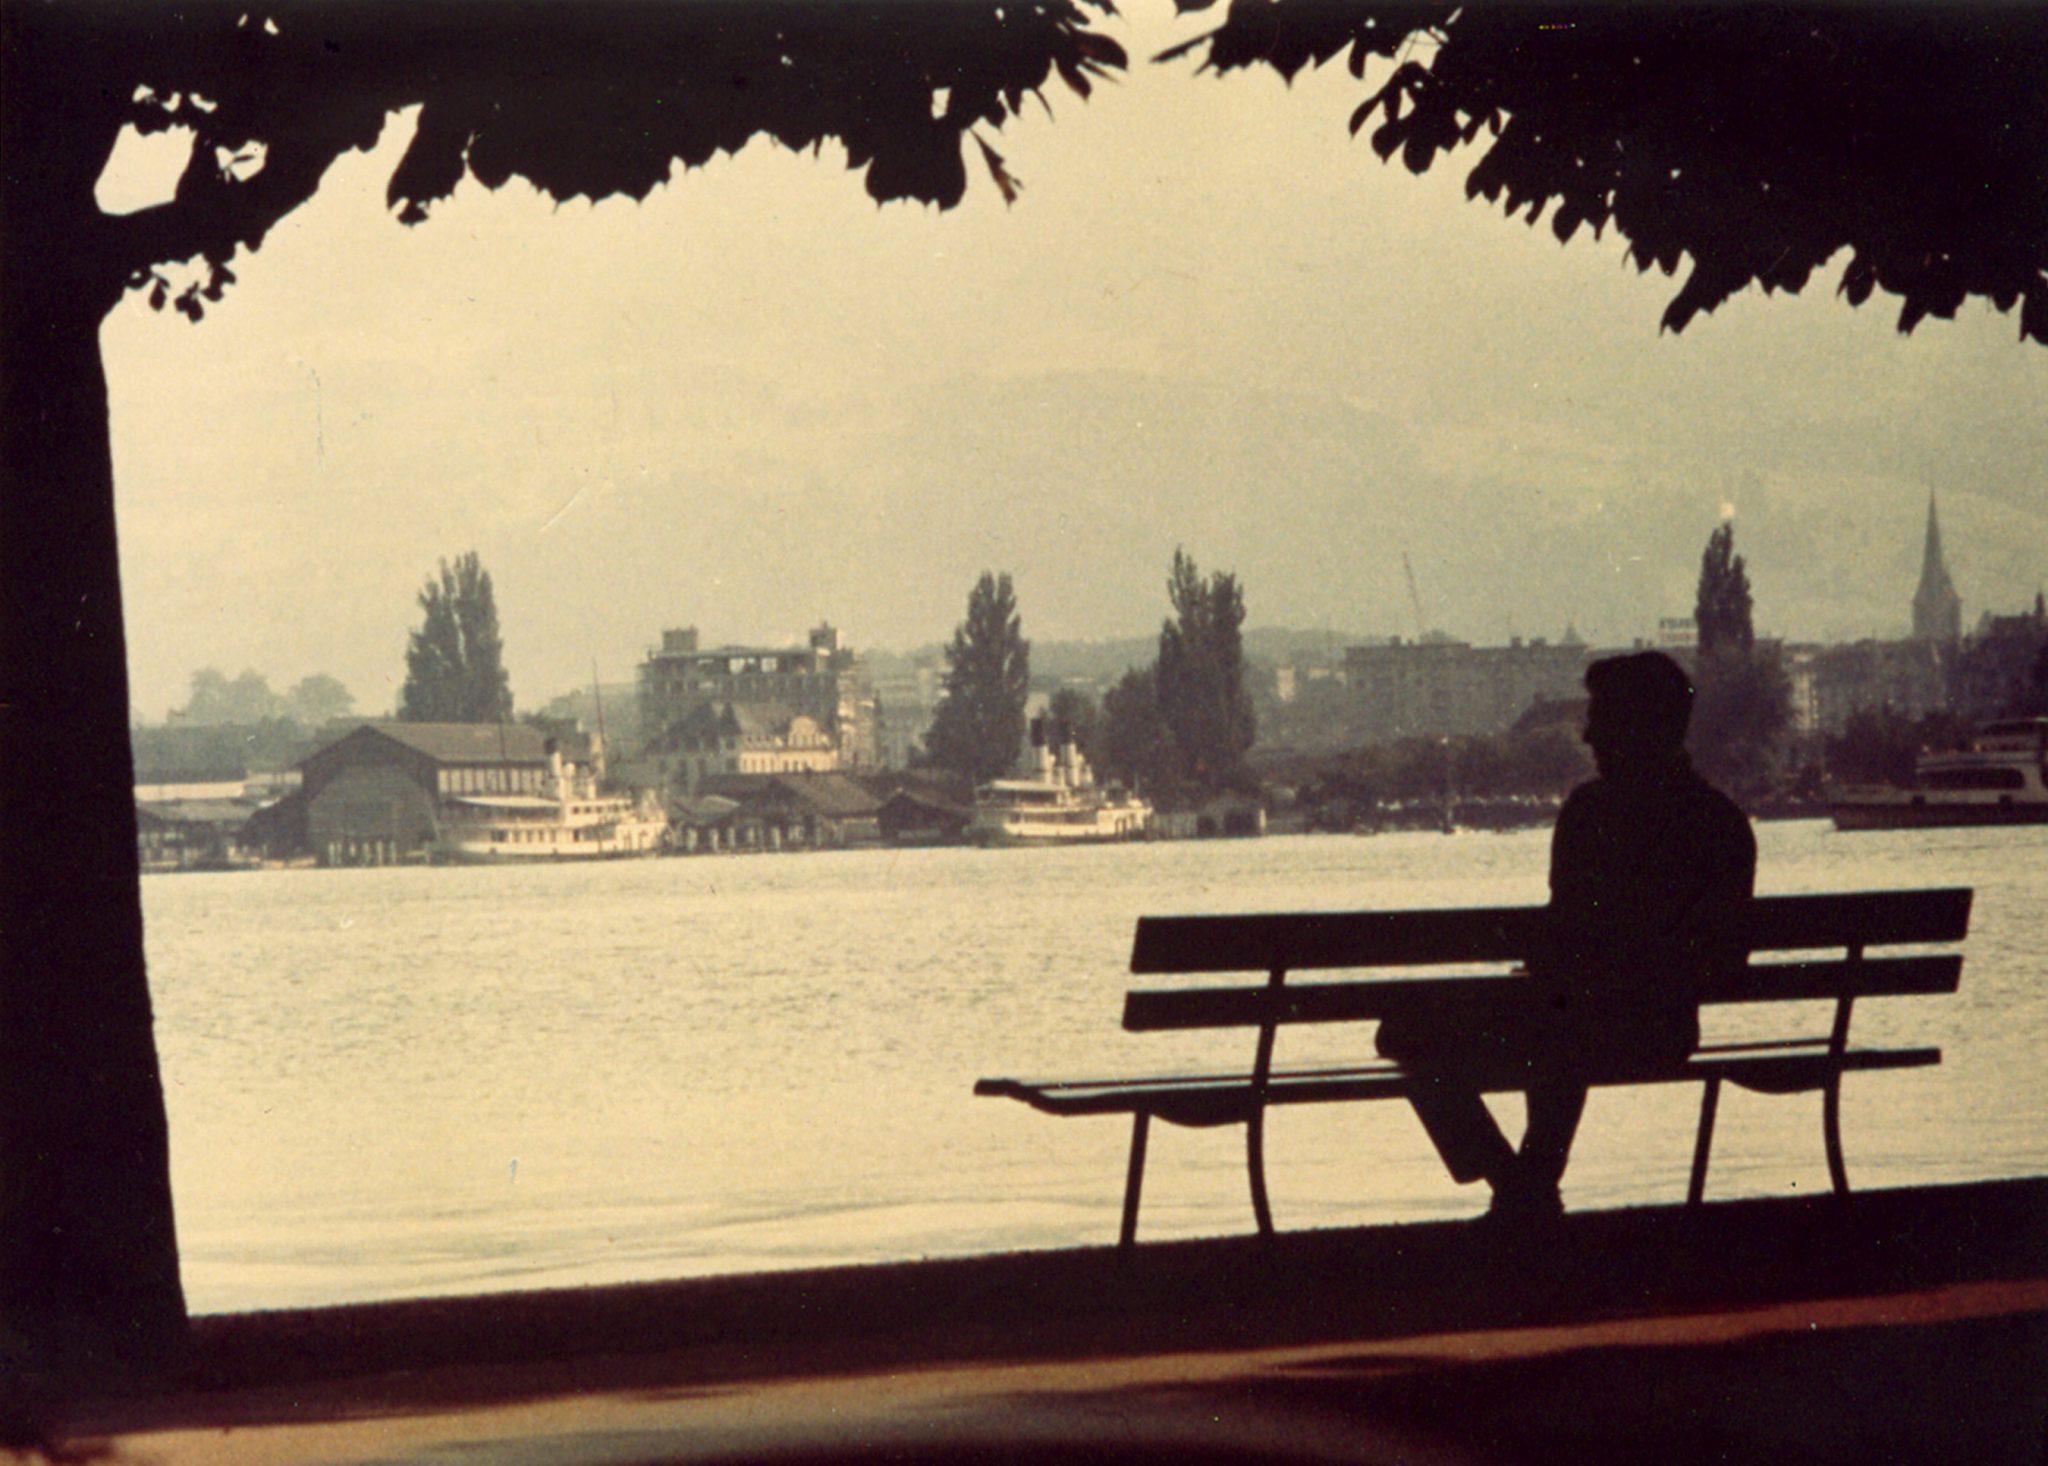 Da Ugo Mulas a Toni Thorimbert. 'Mondi Reali', un mix di visioni fotografiche da Valeria Bella